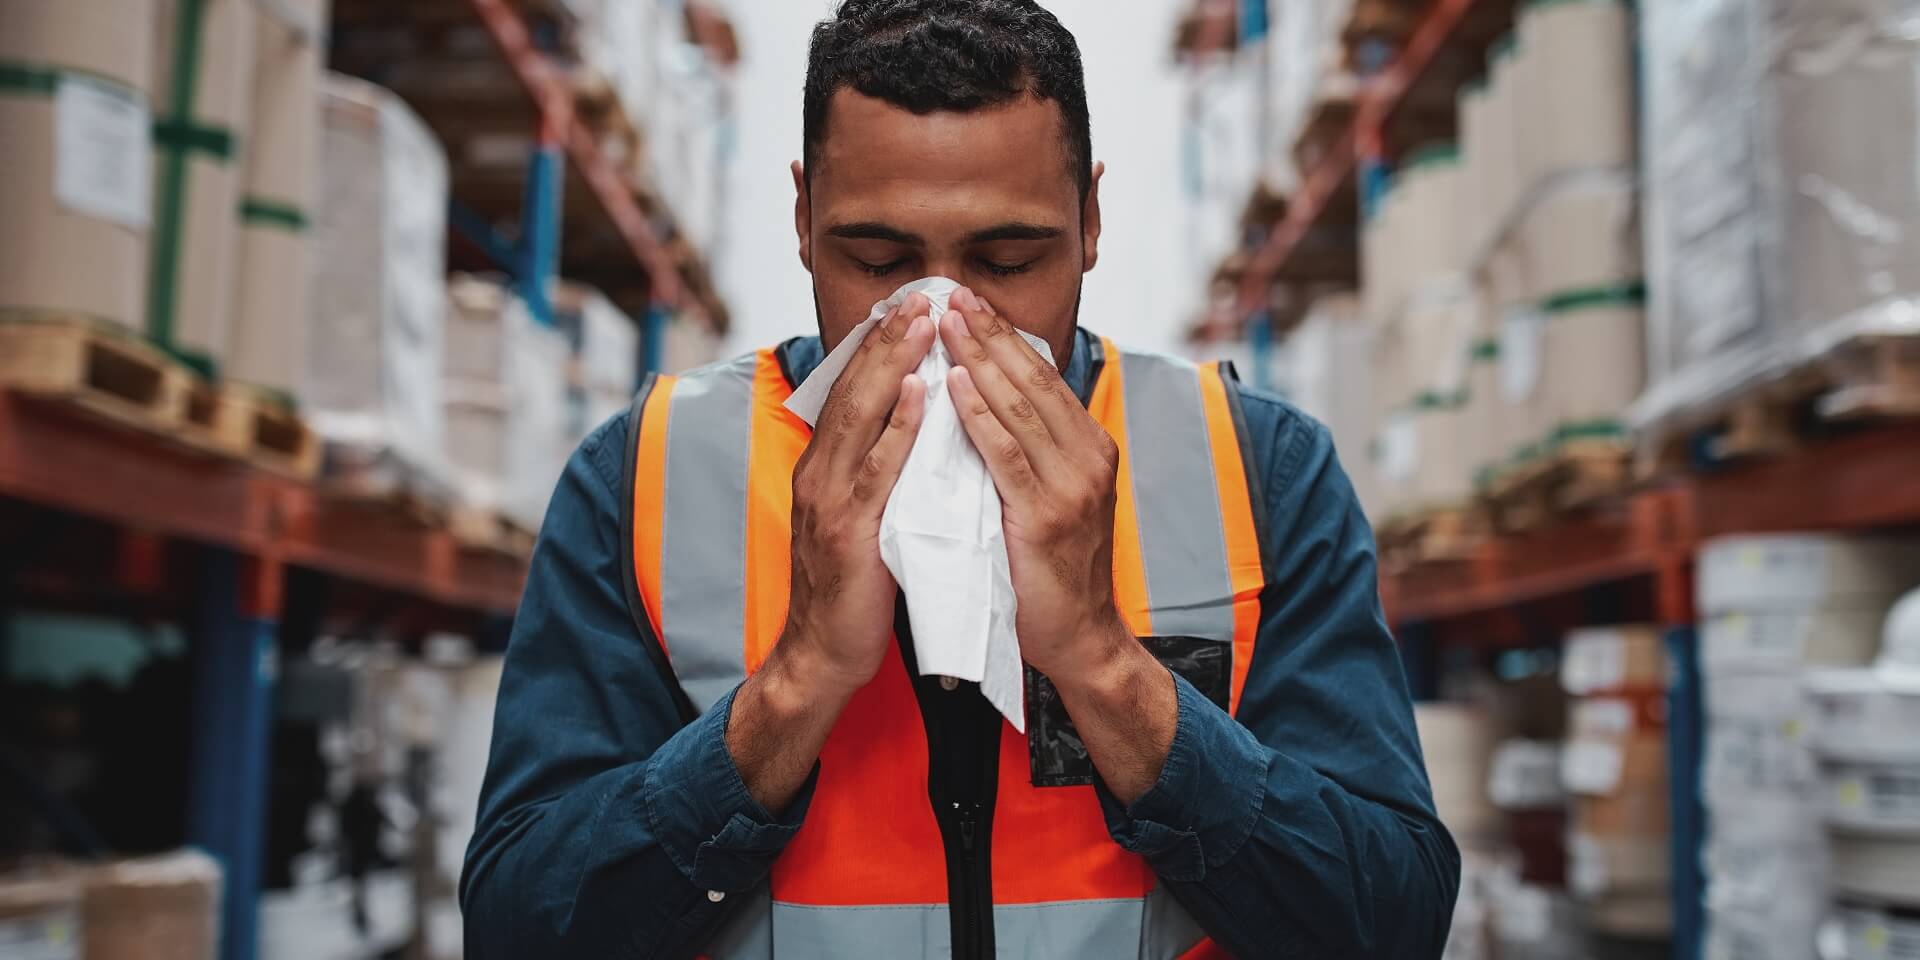 Image of article '4 Ways the Coronavirus Pandemic Is Changing Work'